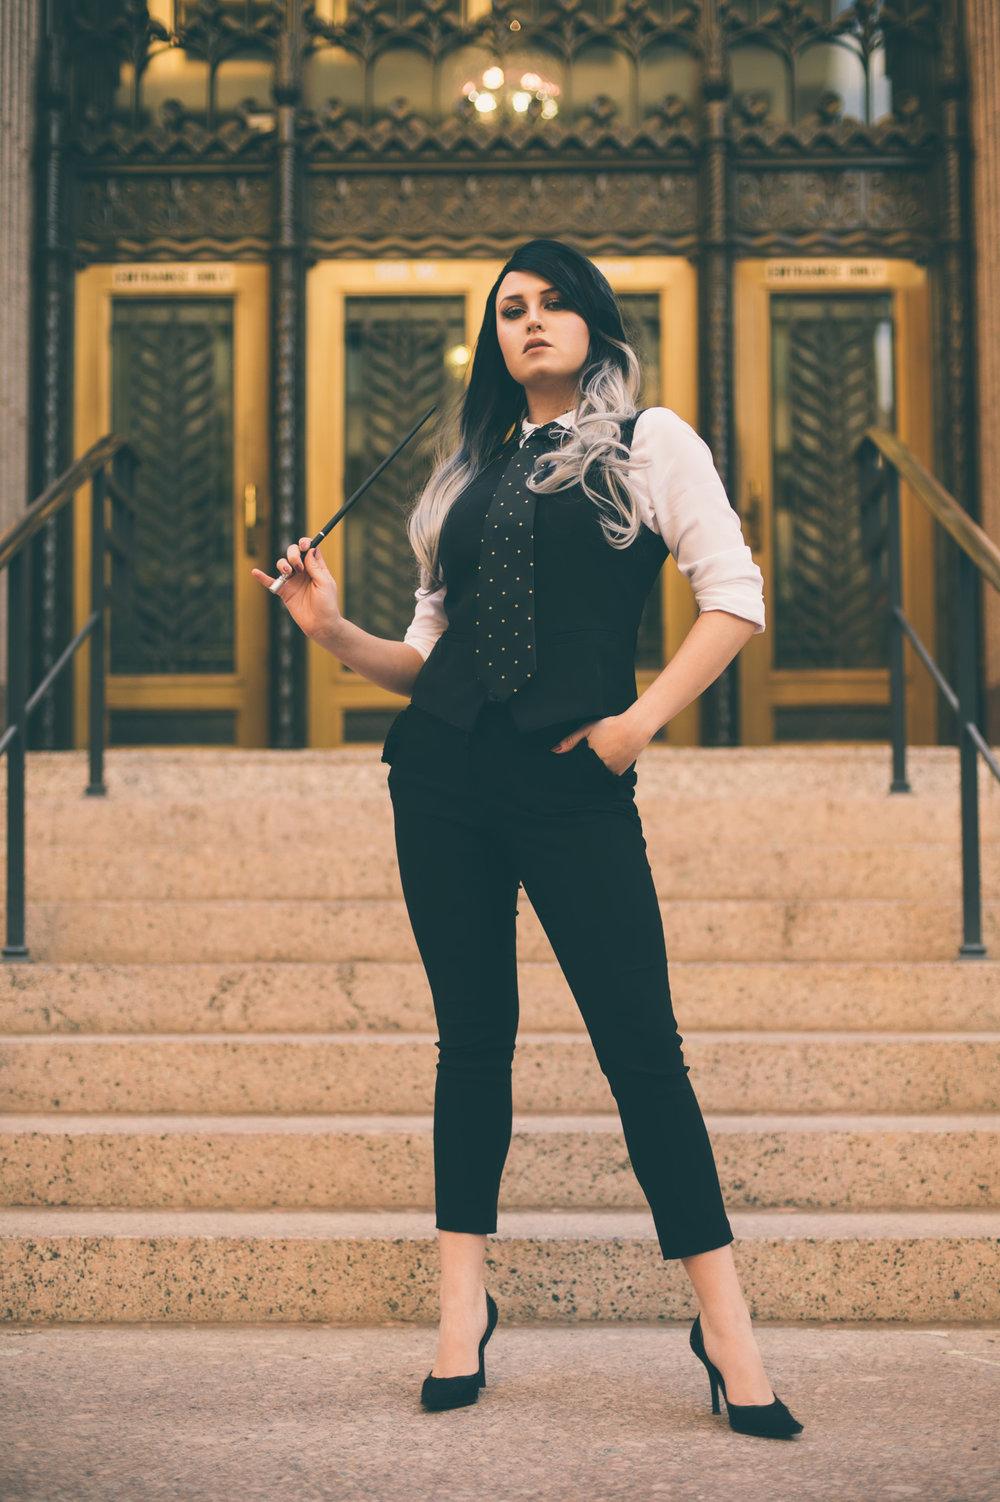 Cosplay Spotlight: Katya as Percival Graves